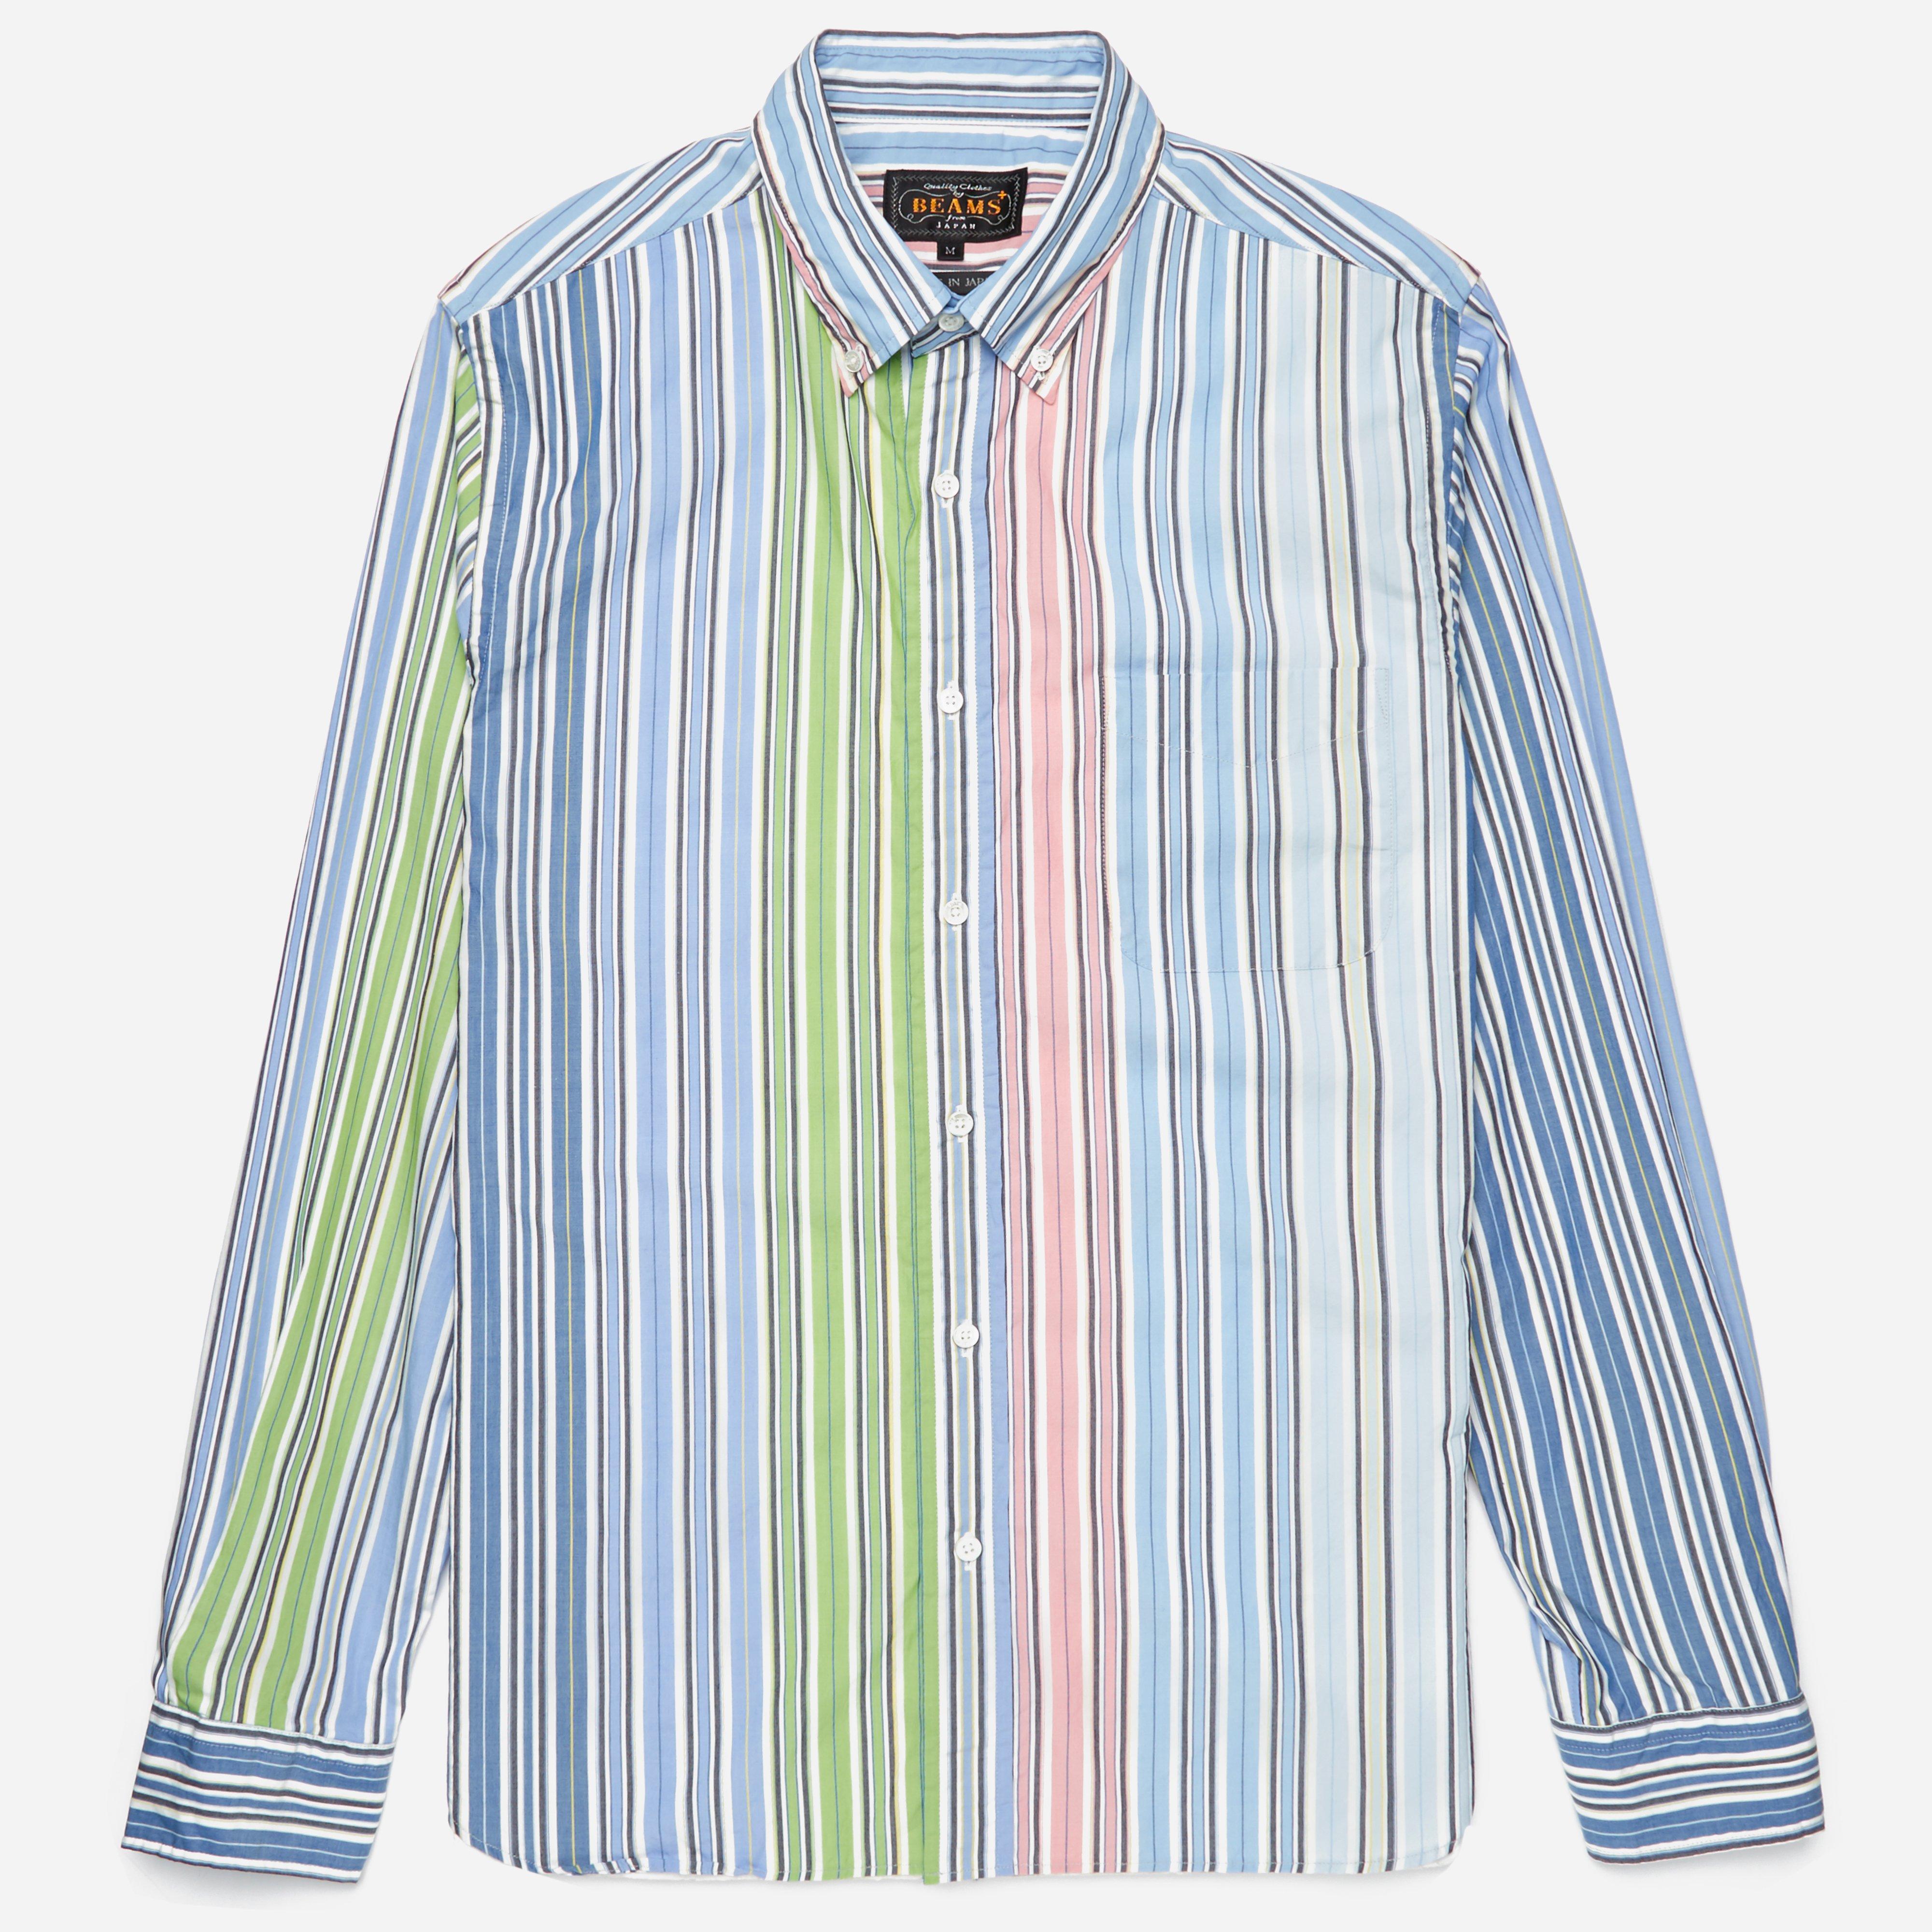 Beams Plus BD Wide Stripe LS Shirt